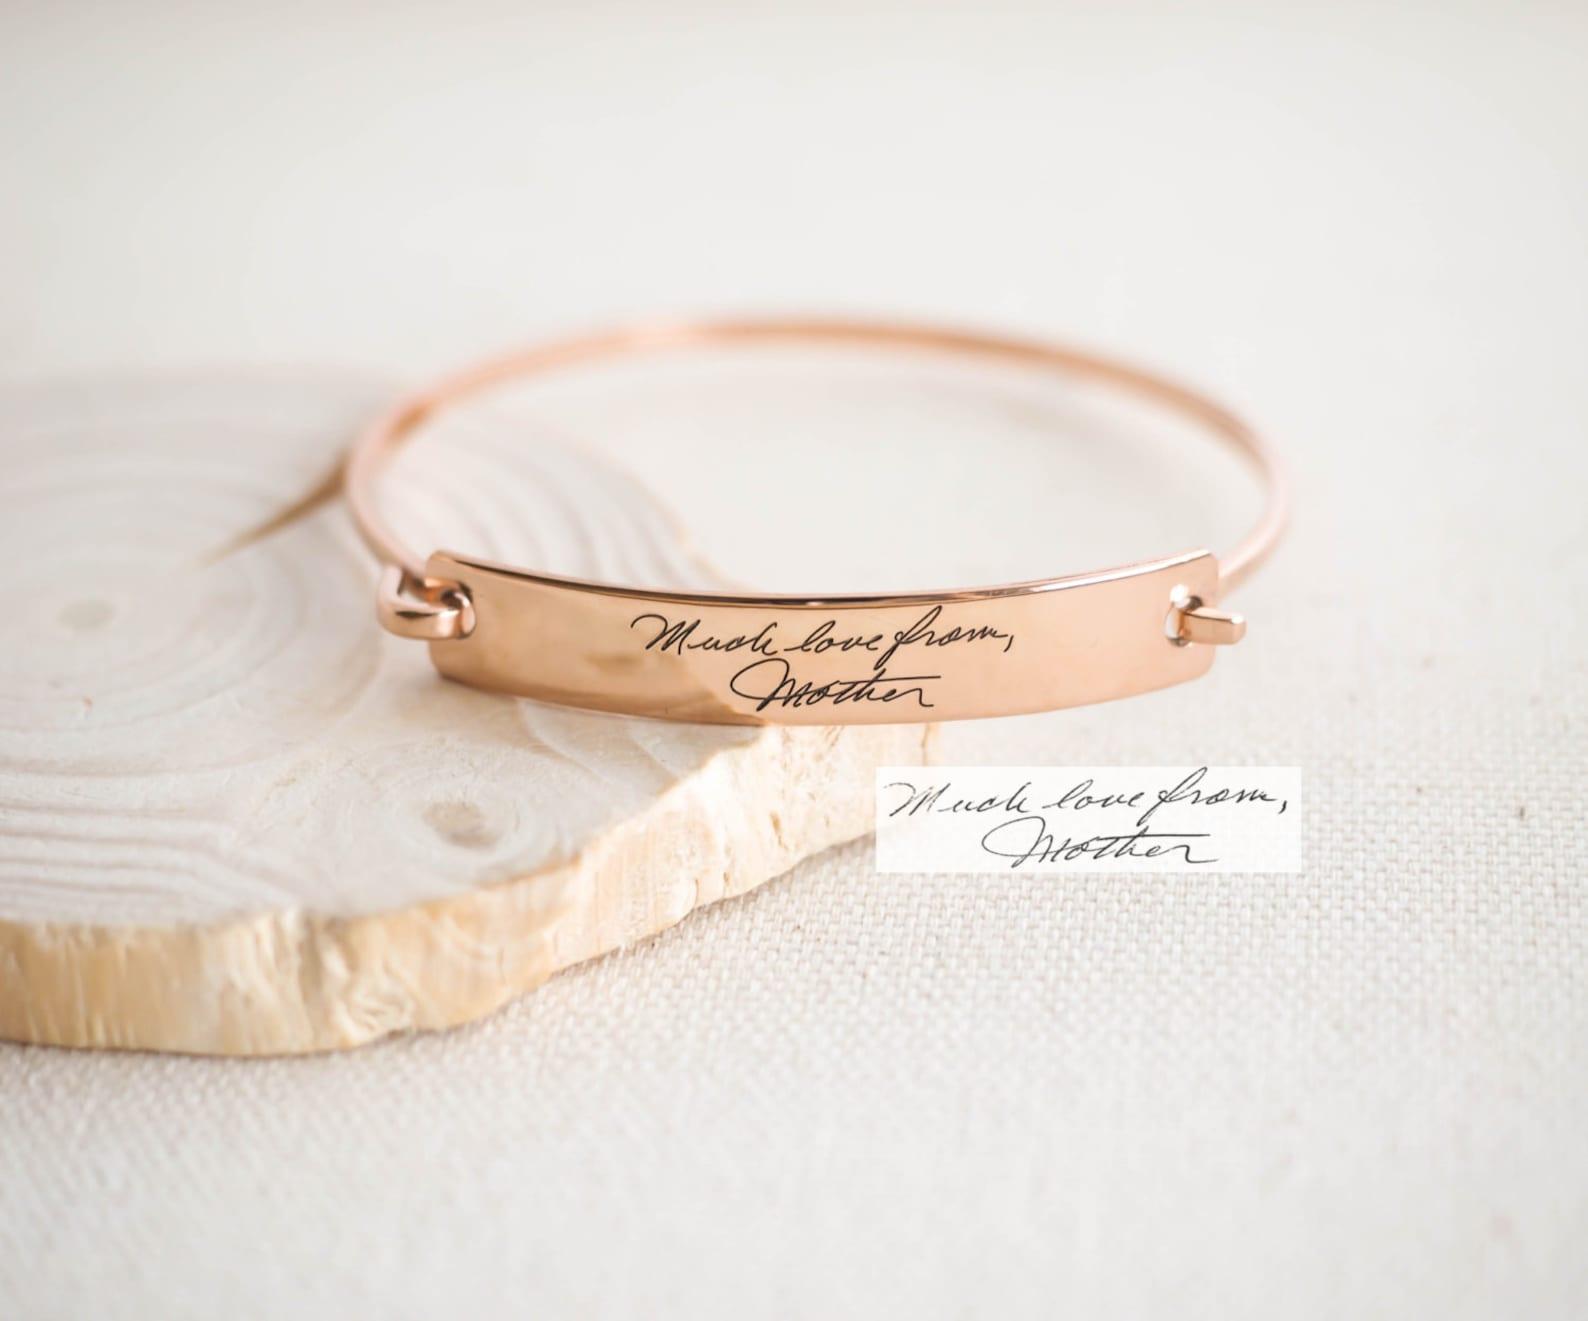 Personalized Signature Bracelets